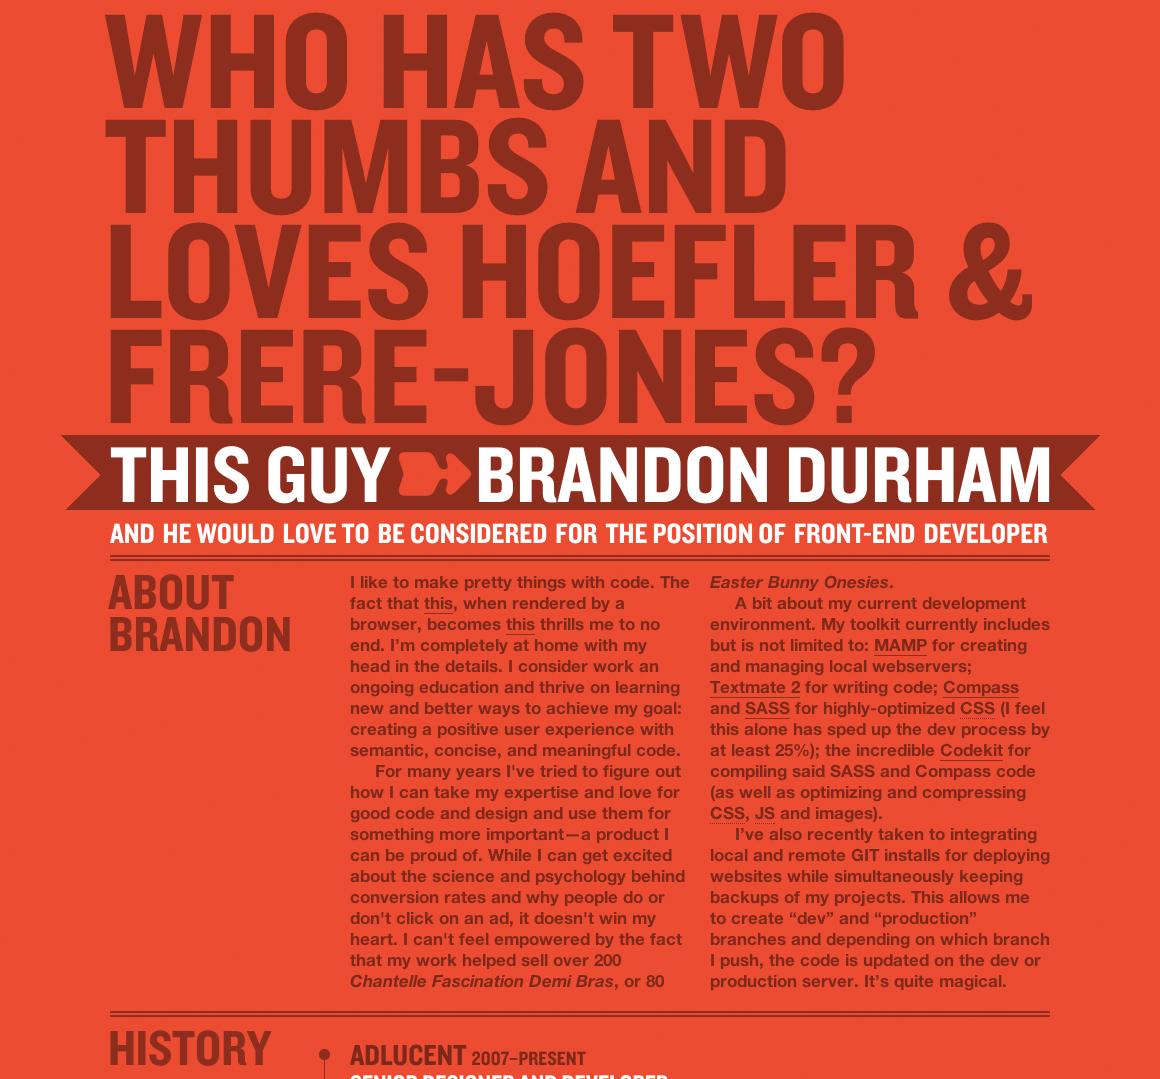 Hoefler & Frere-Jones + Brandon Durham = Pure Magic Website Screenshot